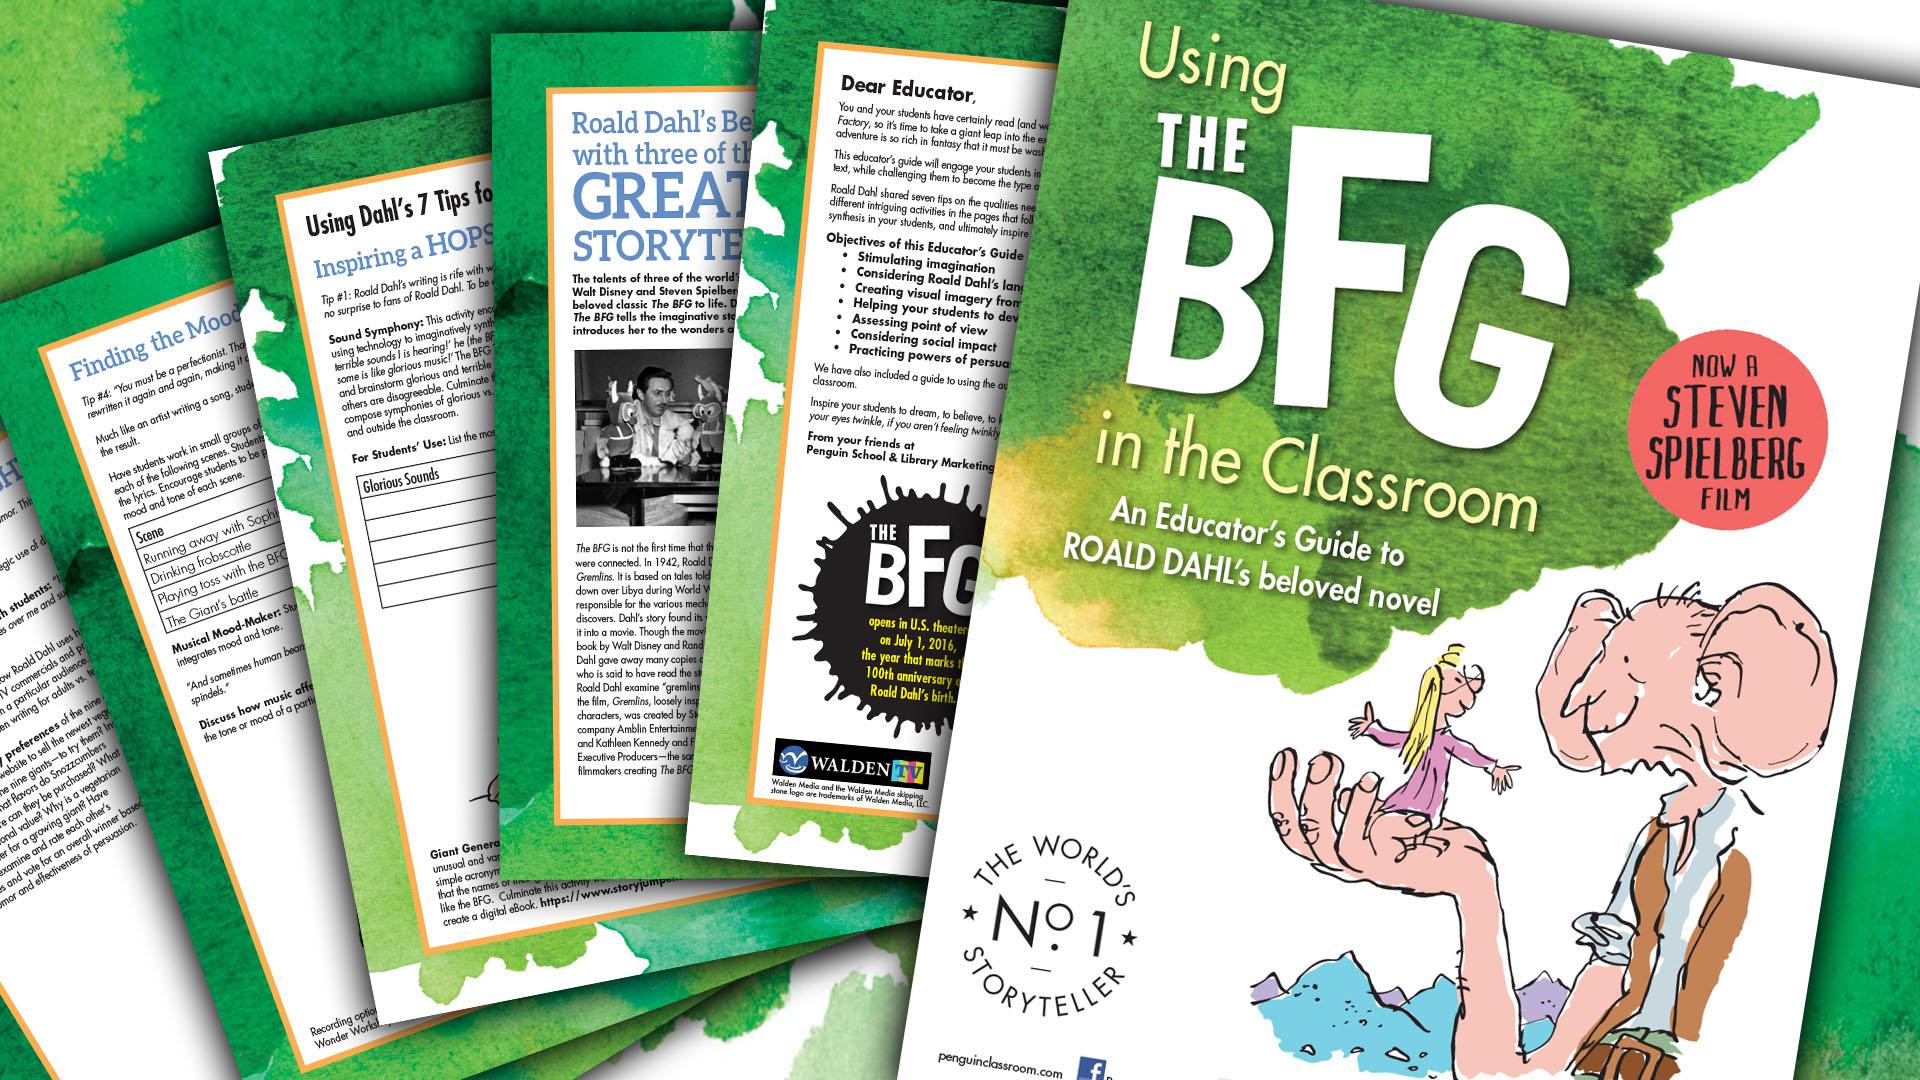 The BFG: Educational Guide